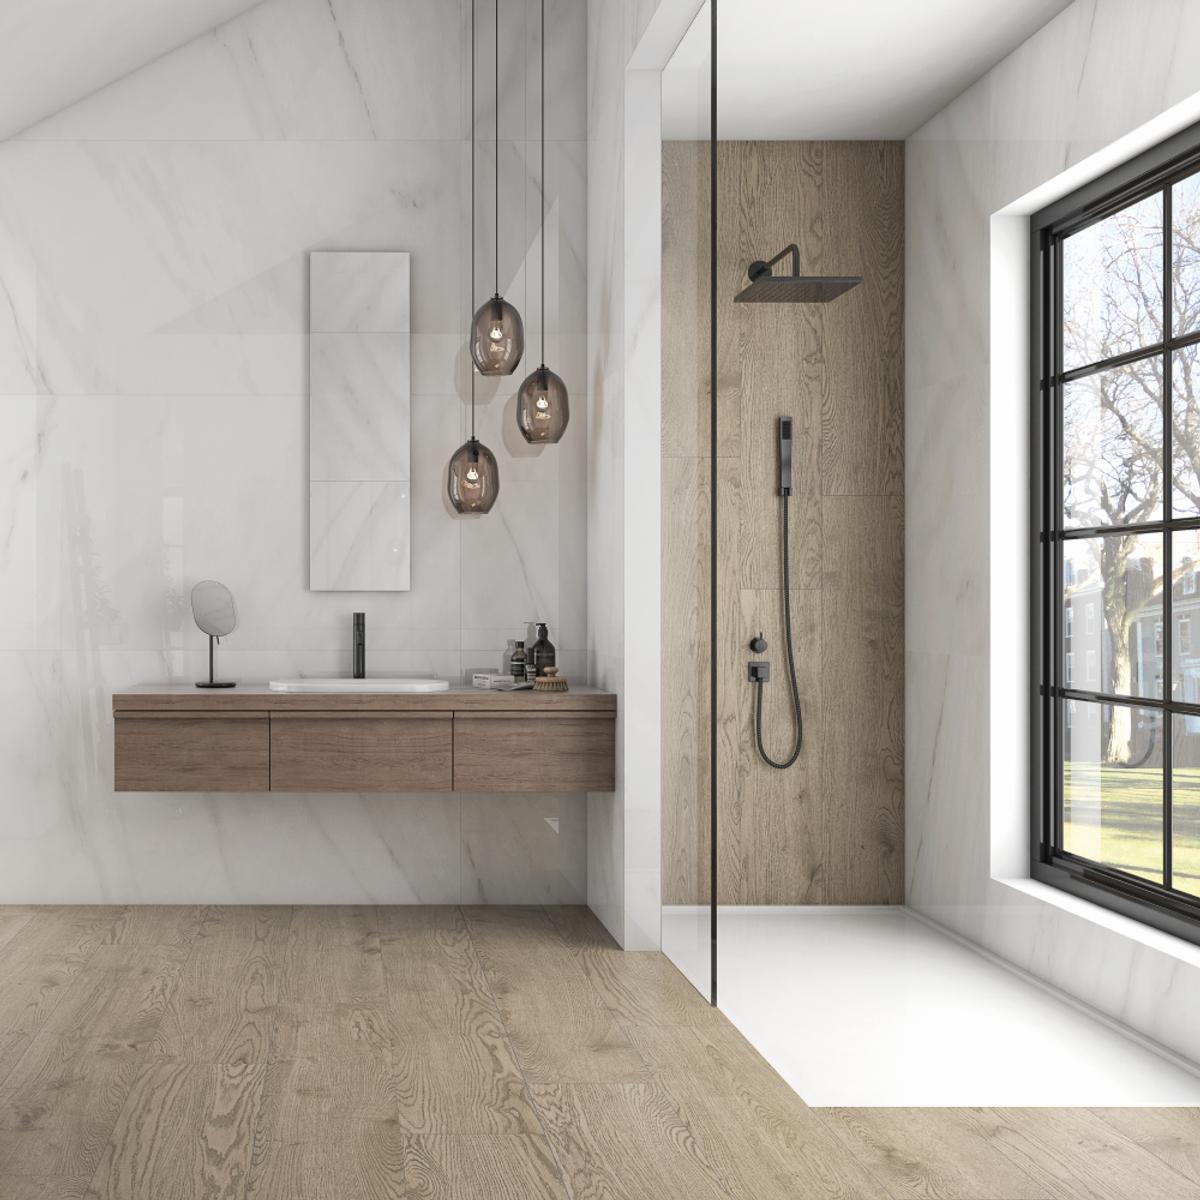 Tuscany KA Wood Floor Tile ROV 22,5x180 order instore or online @ www.tuscanytiles.co.uk